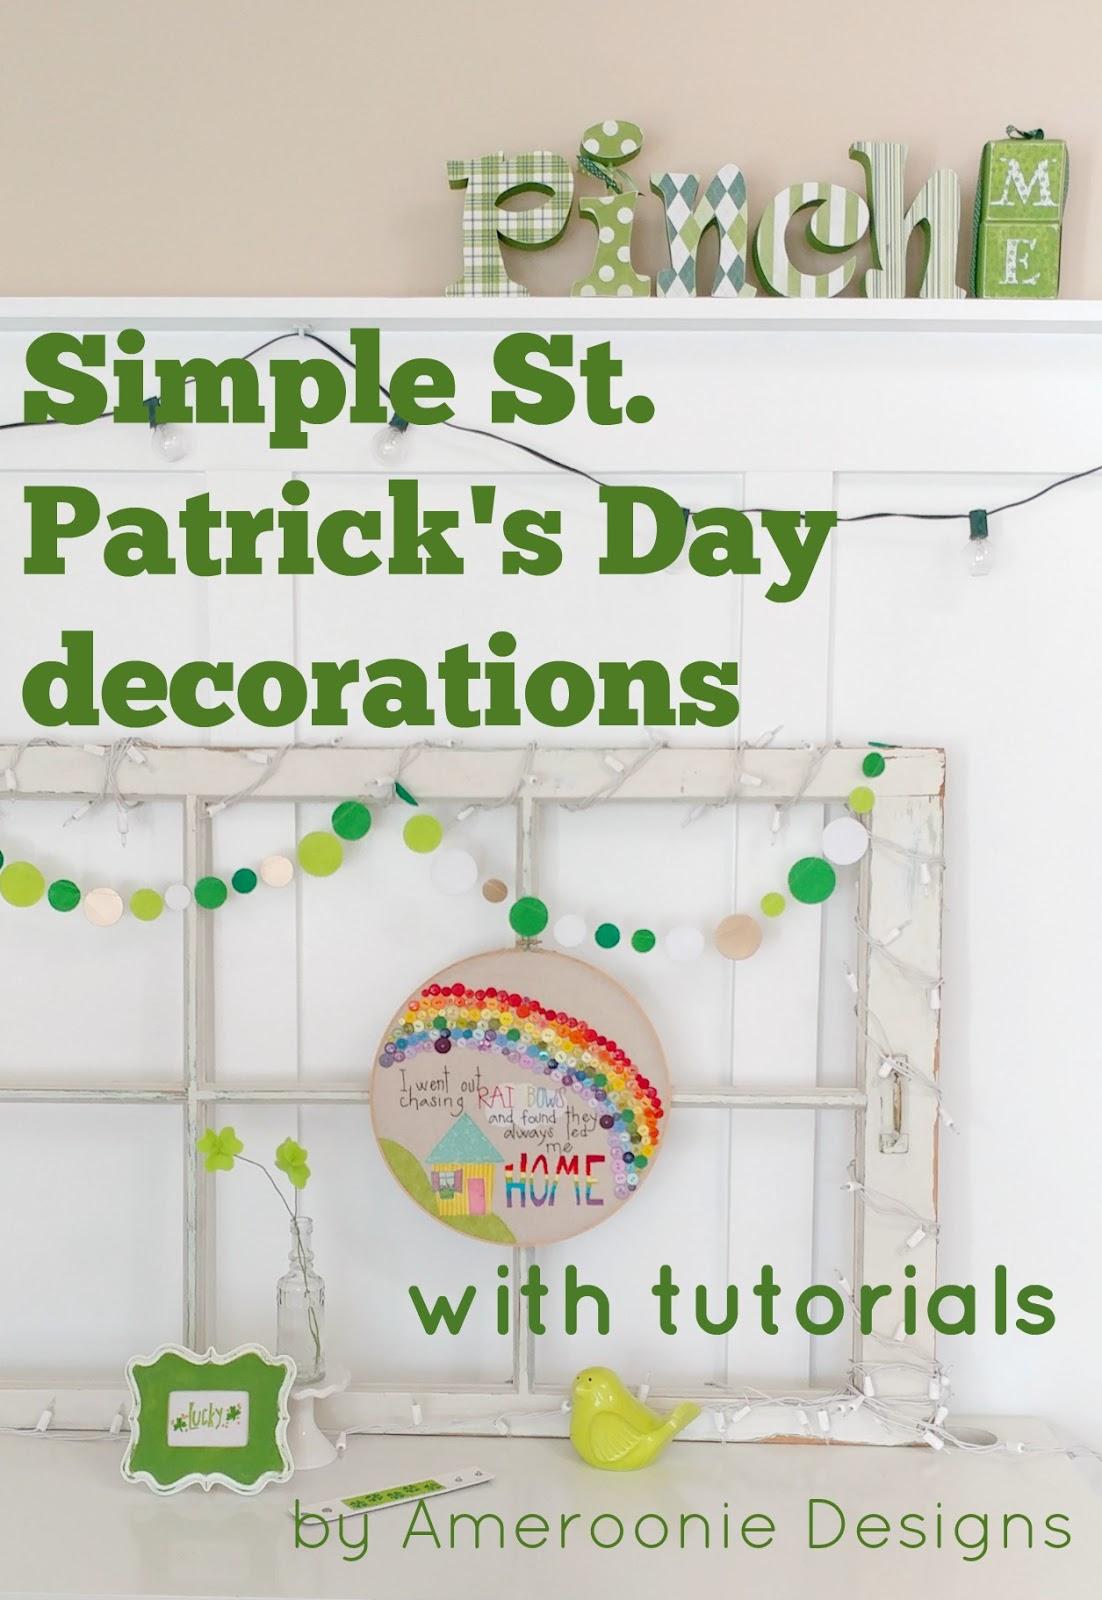 Ameroonie designs simple st patrick 39 s day decorations for St patricks day home decorations